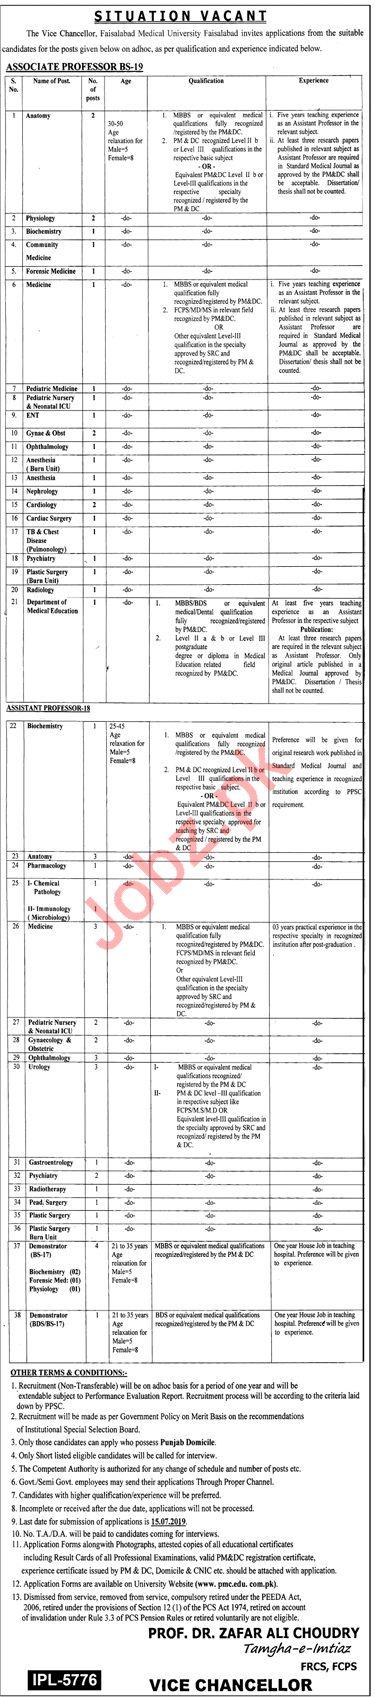 Faisalabad Medical University Jobs 2019